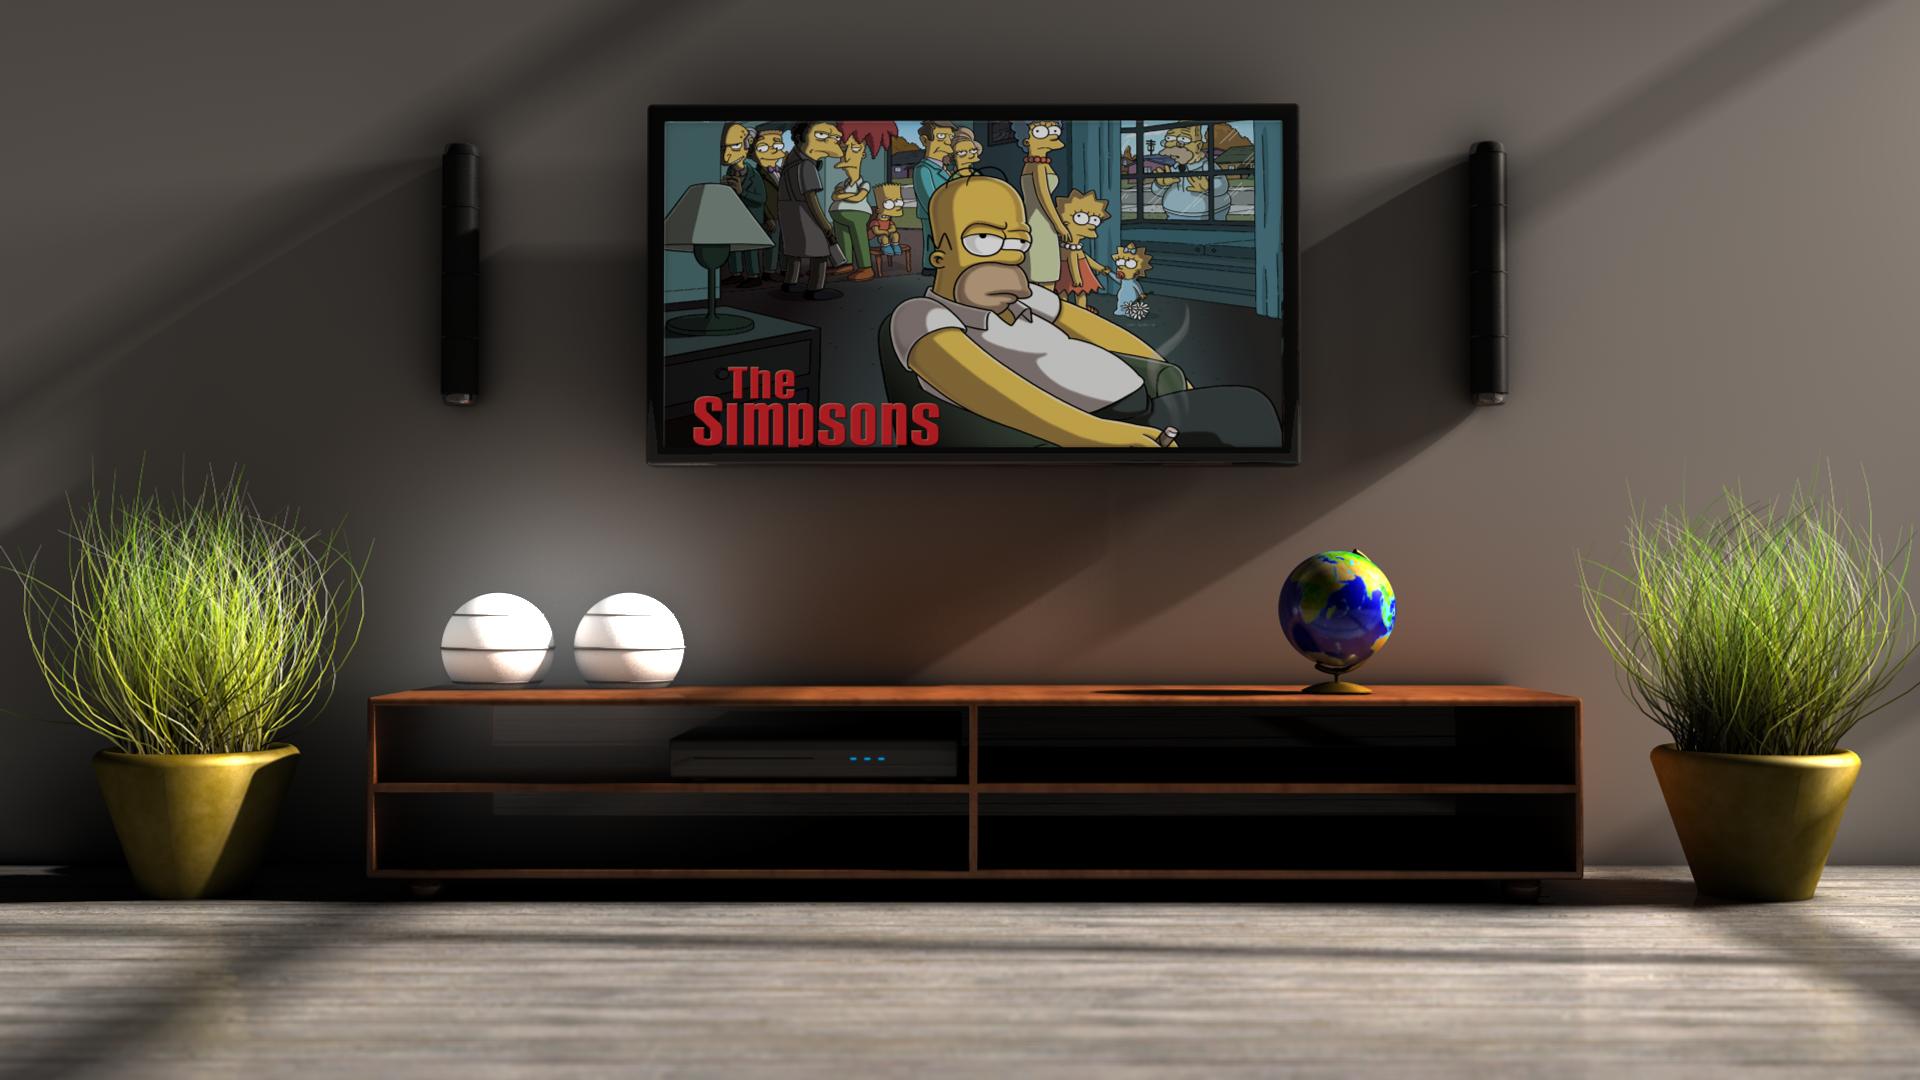 XBMC TV Shows 1080p by RaySpoint 1920x1080